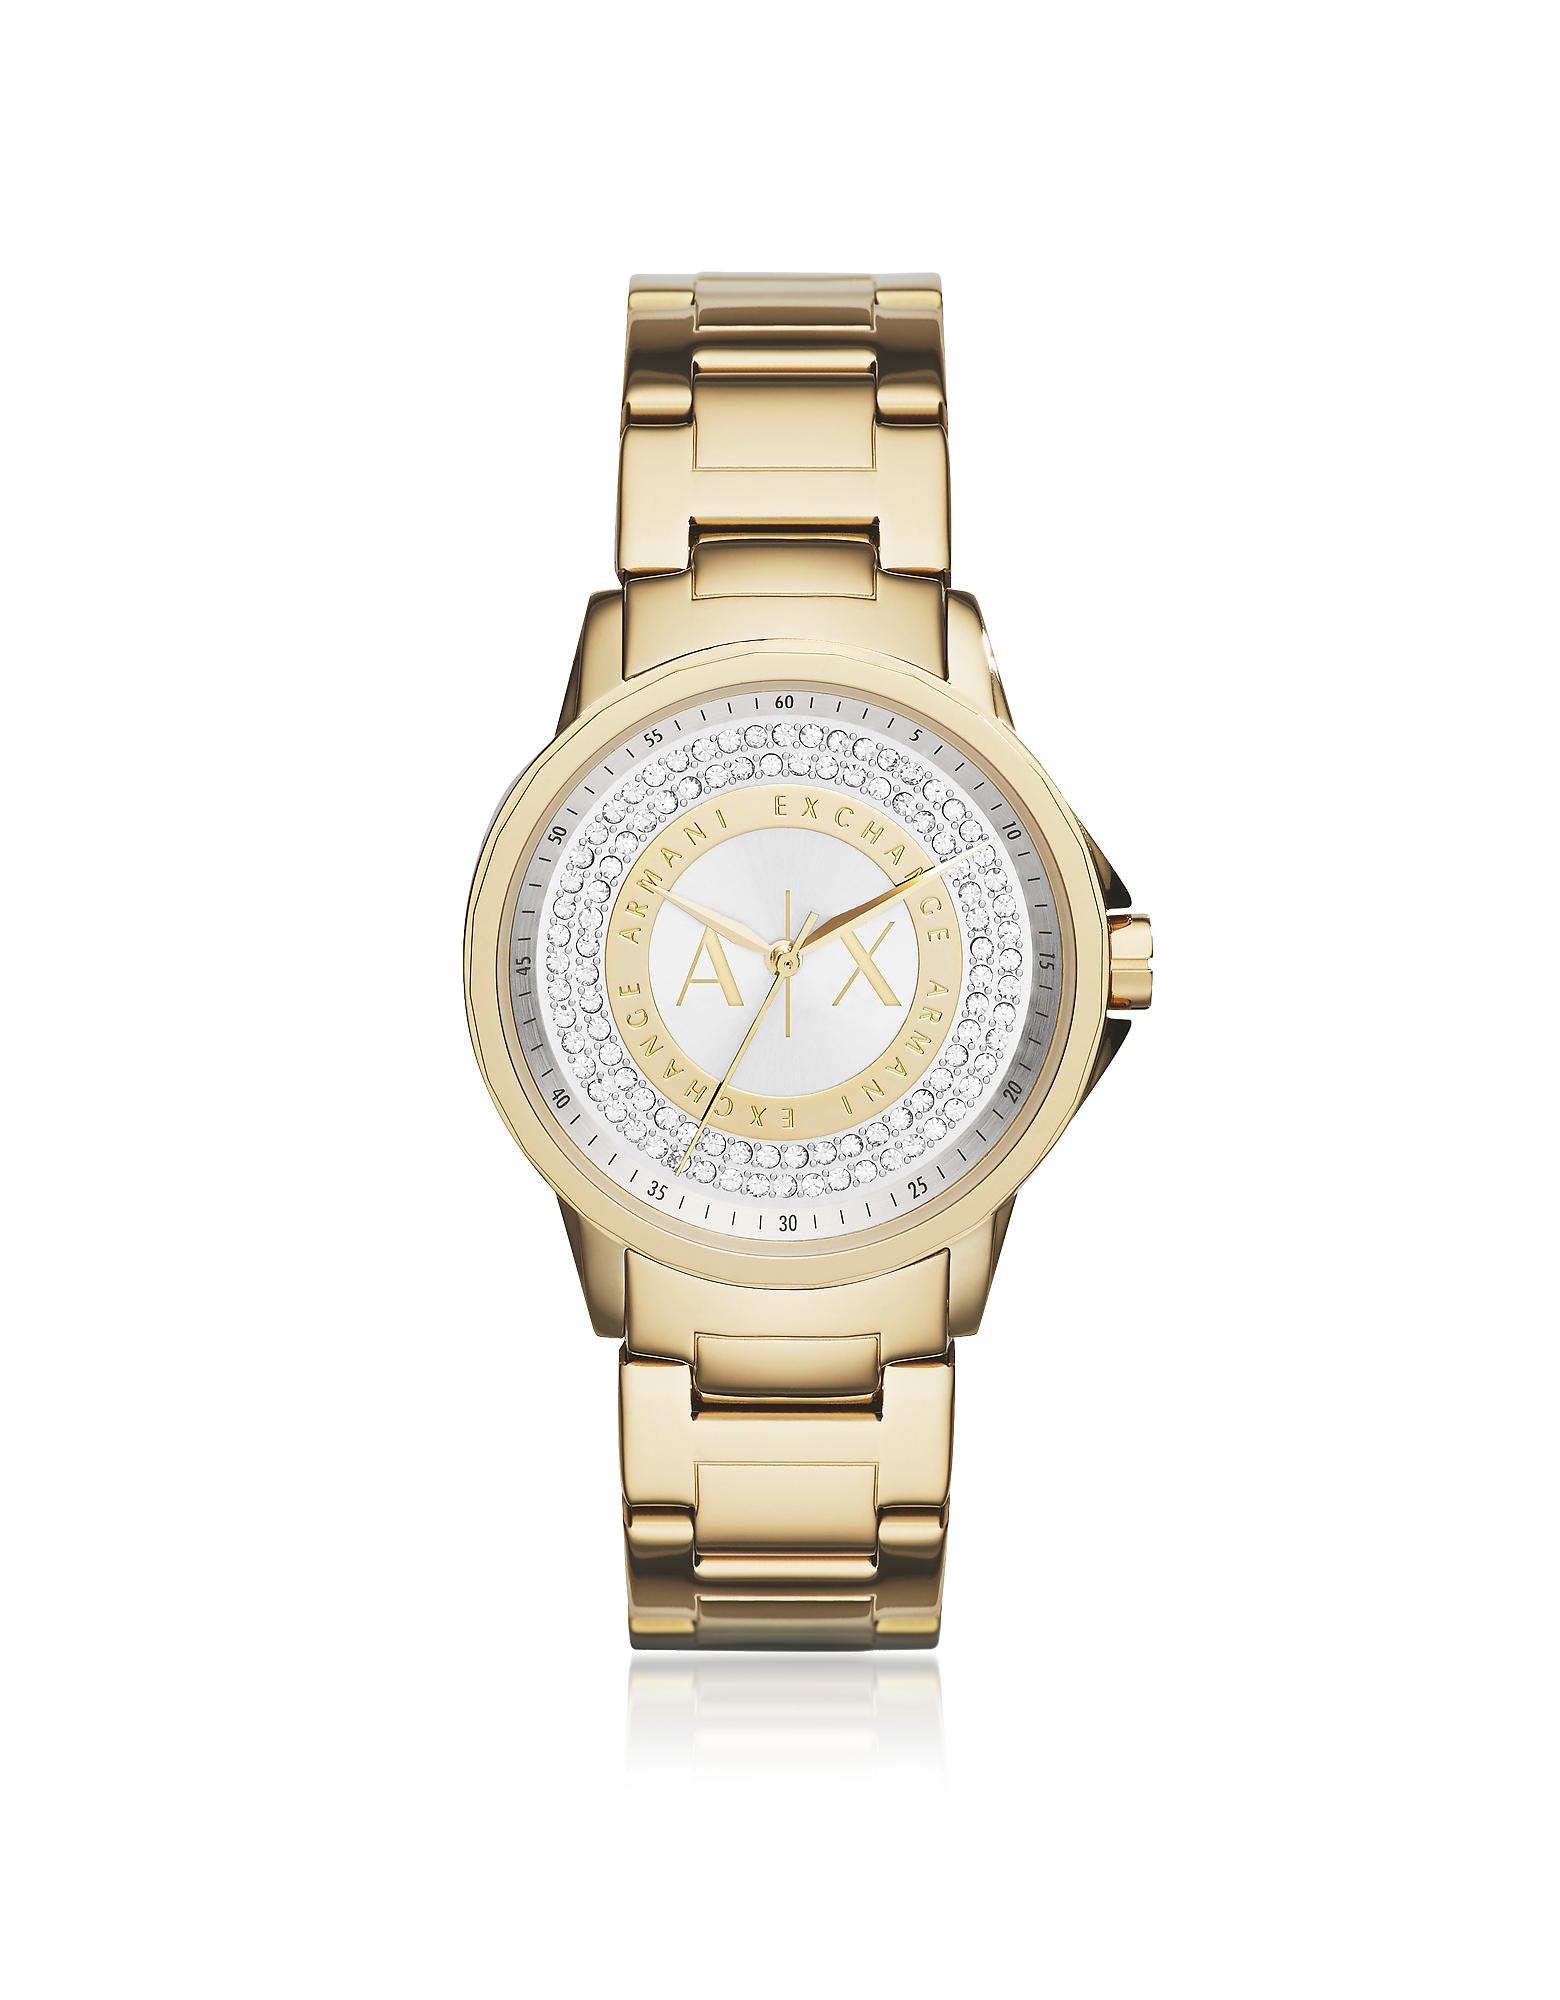 Armani Exchange Women's Watches, Lady Banks Gold Tone Women's Watch